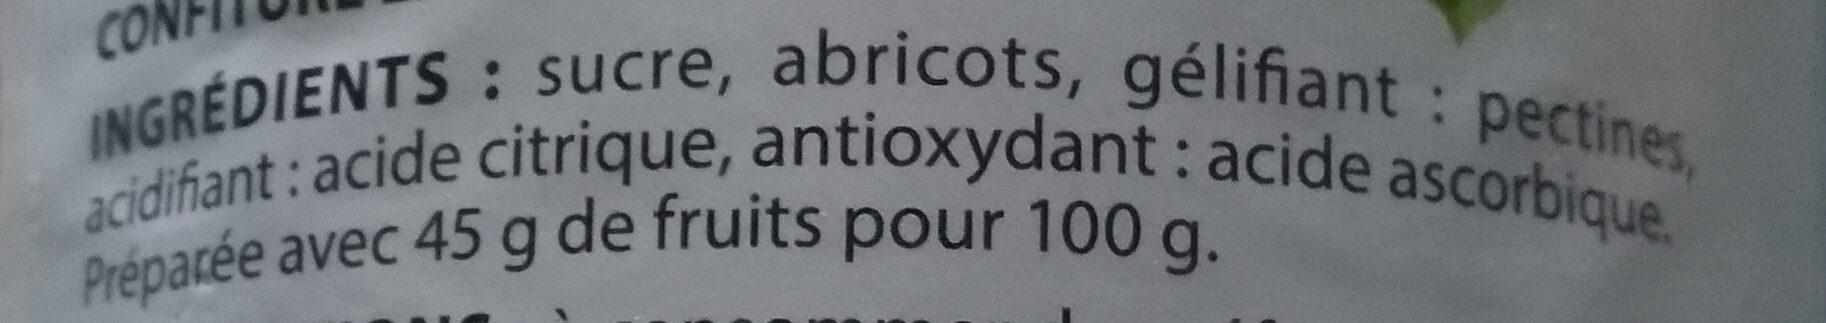 Confiture d'abricot - Ingredients - fr